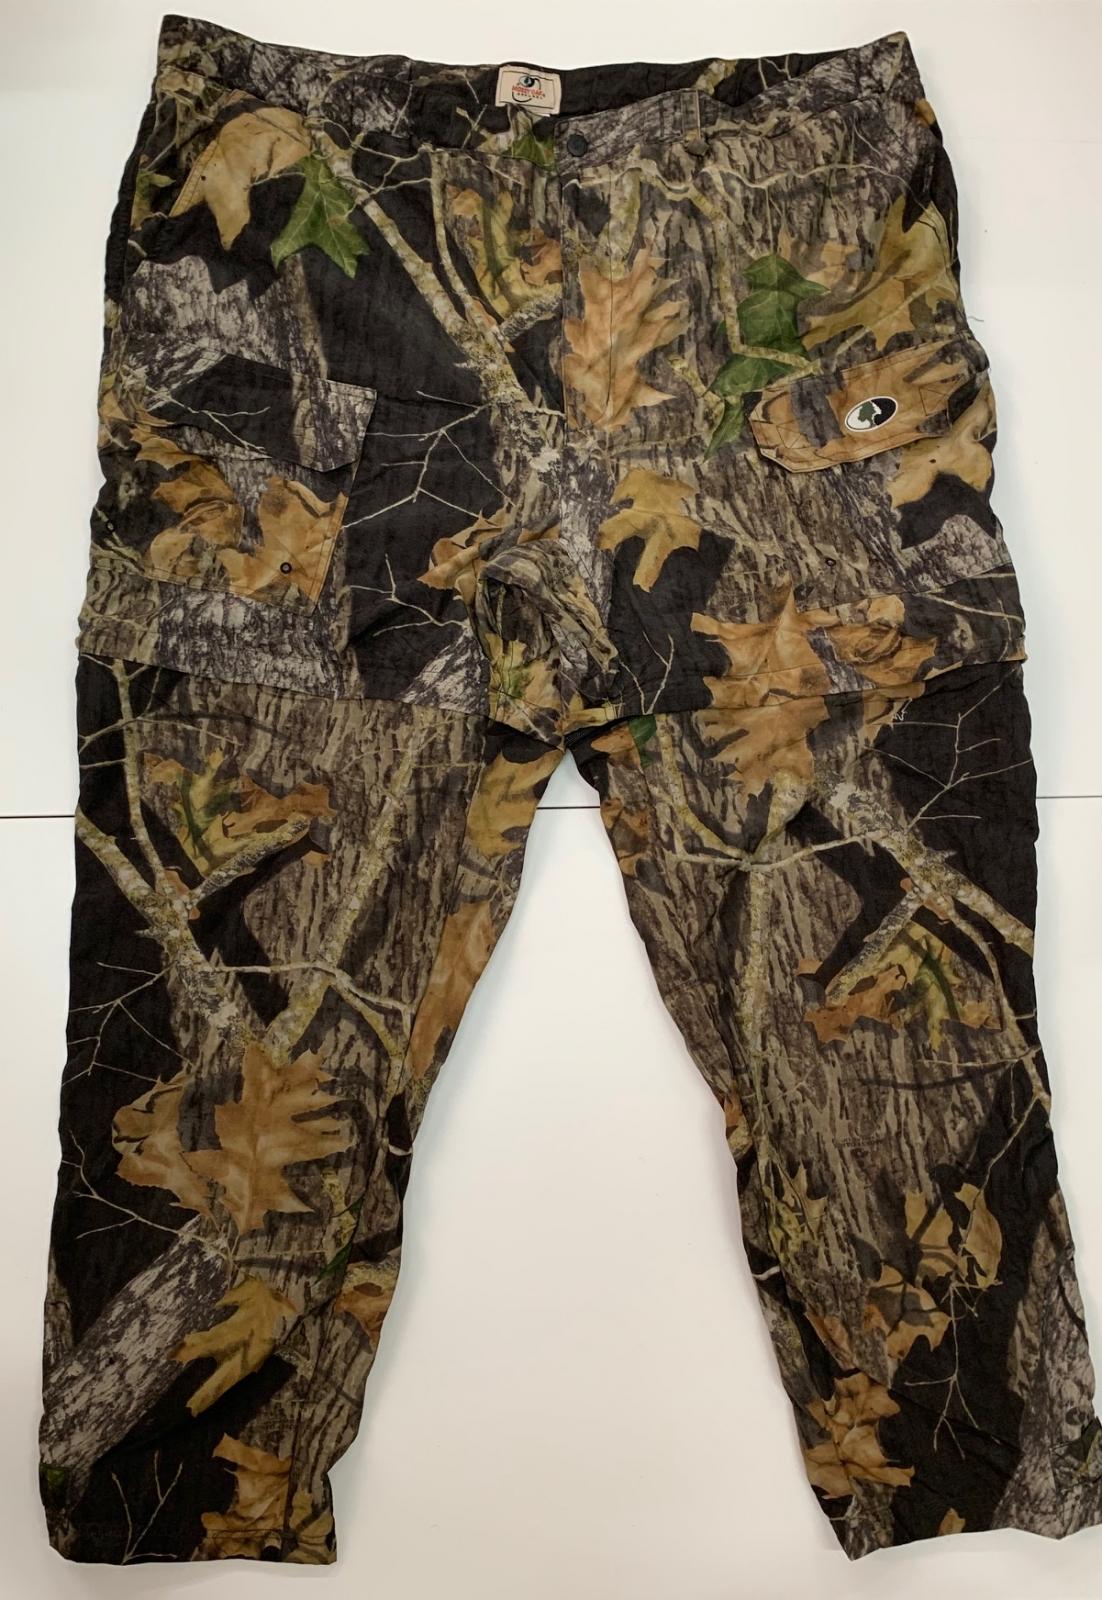 Штаны-шорты камуфляжные мужские от бренда RUSSELL OUTDOORS